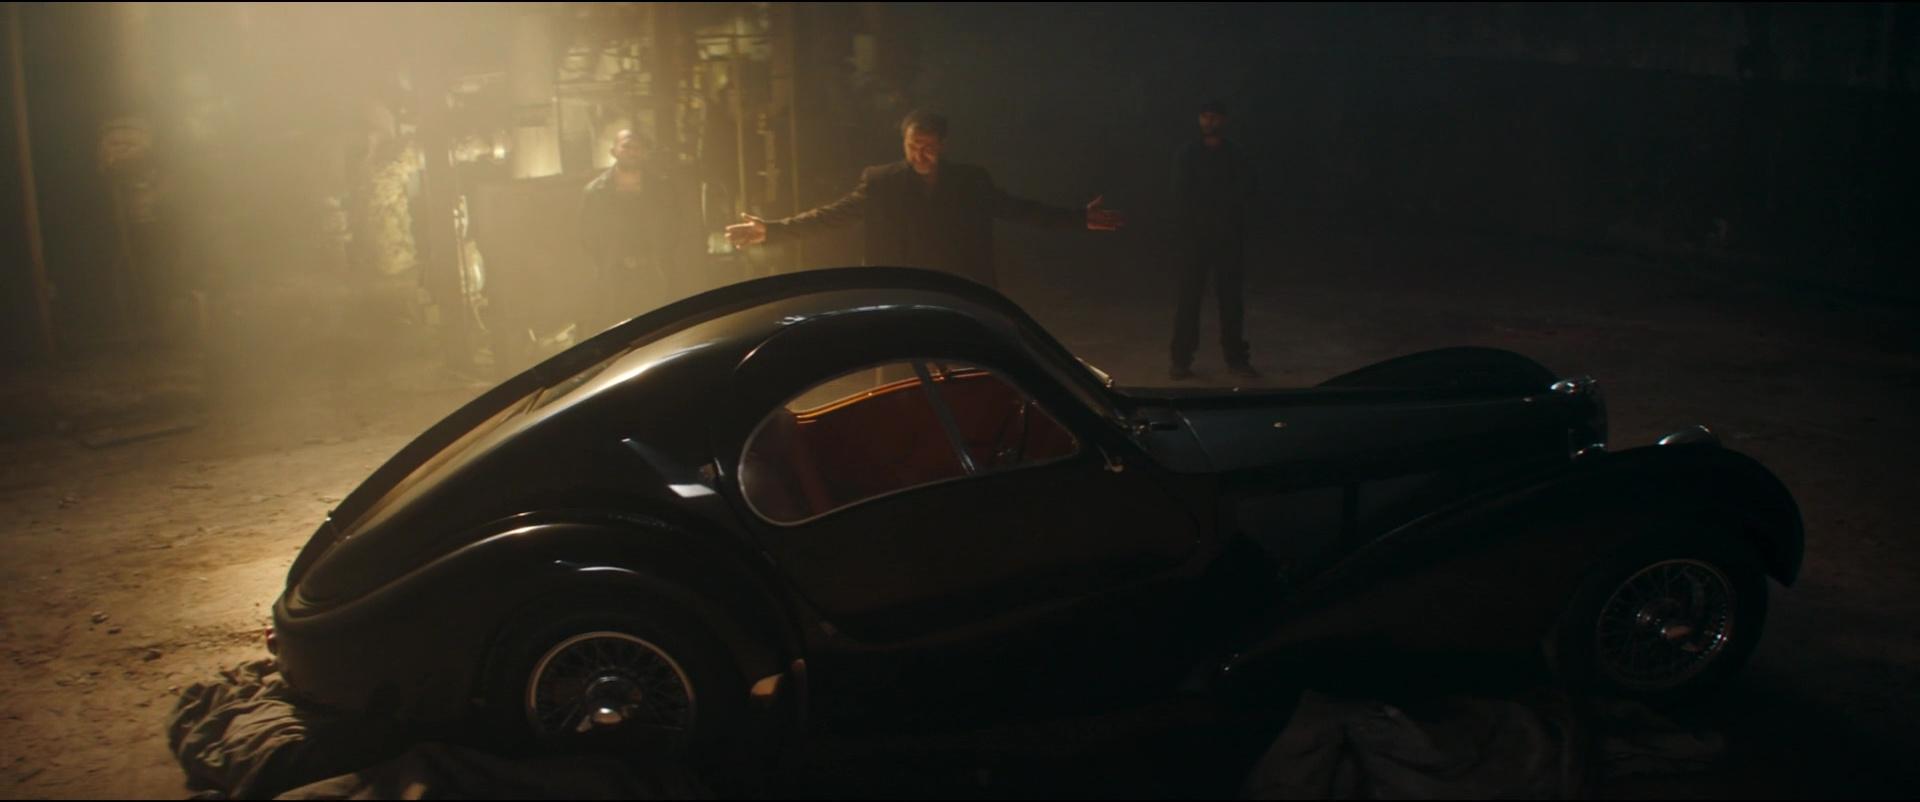 Bugatti Type 57 S Atlantic Car In Overdrive 2017 Movie